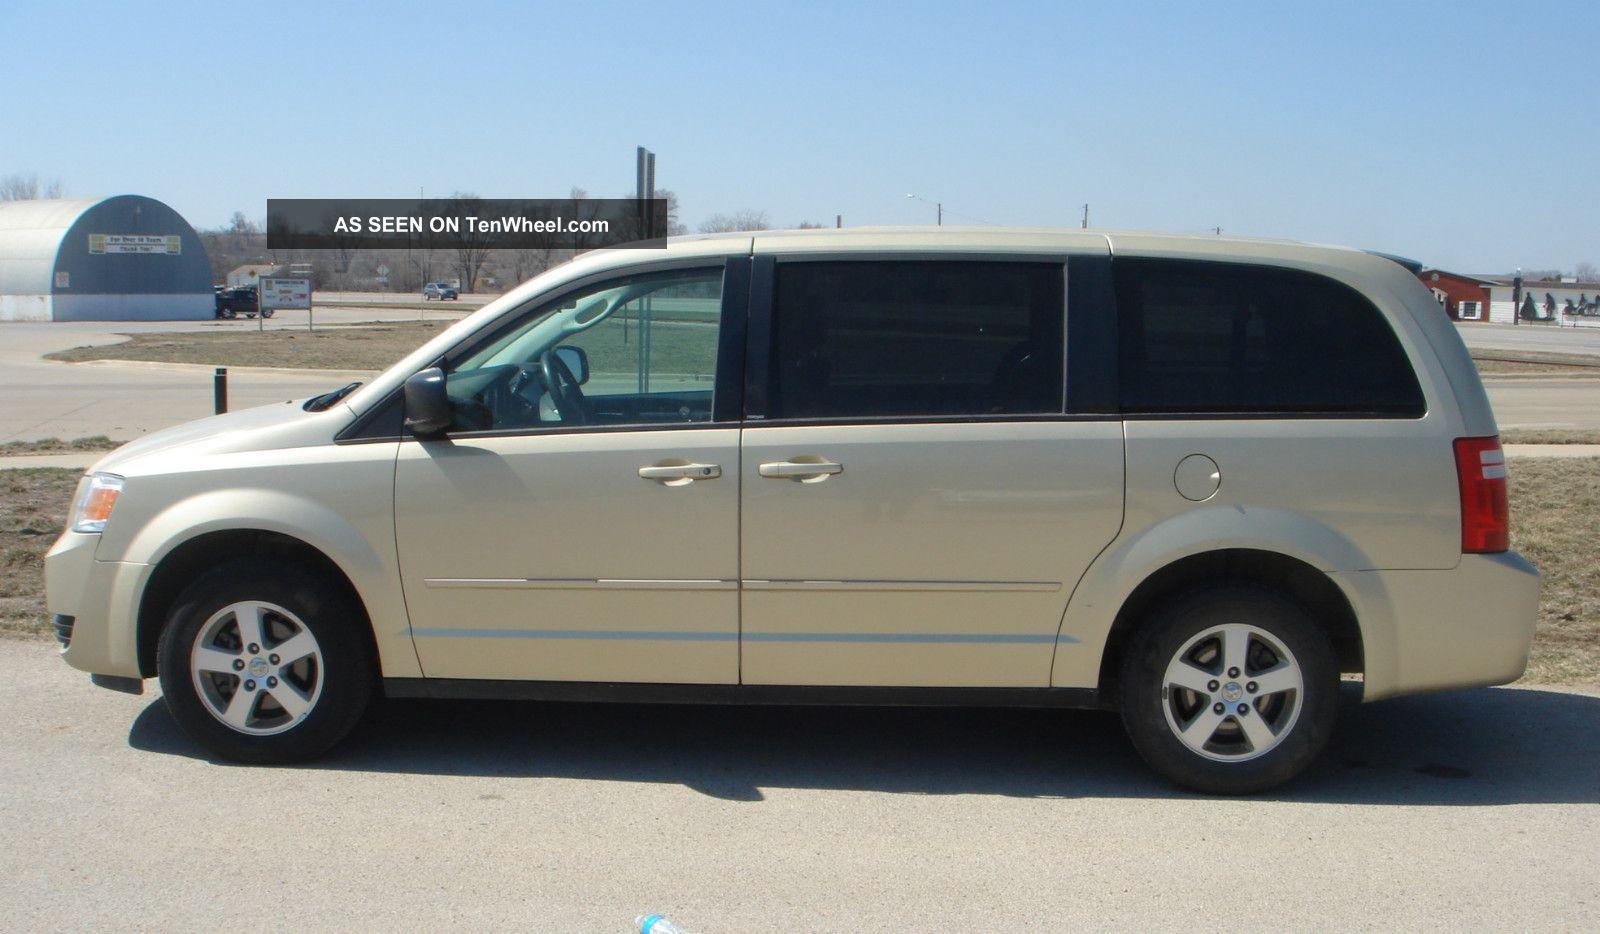 2010 Ford Flex Fuel | Upcomingcarshq.com